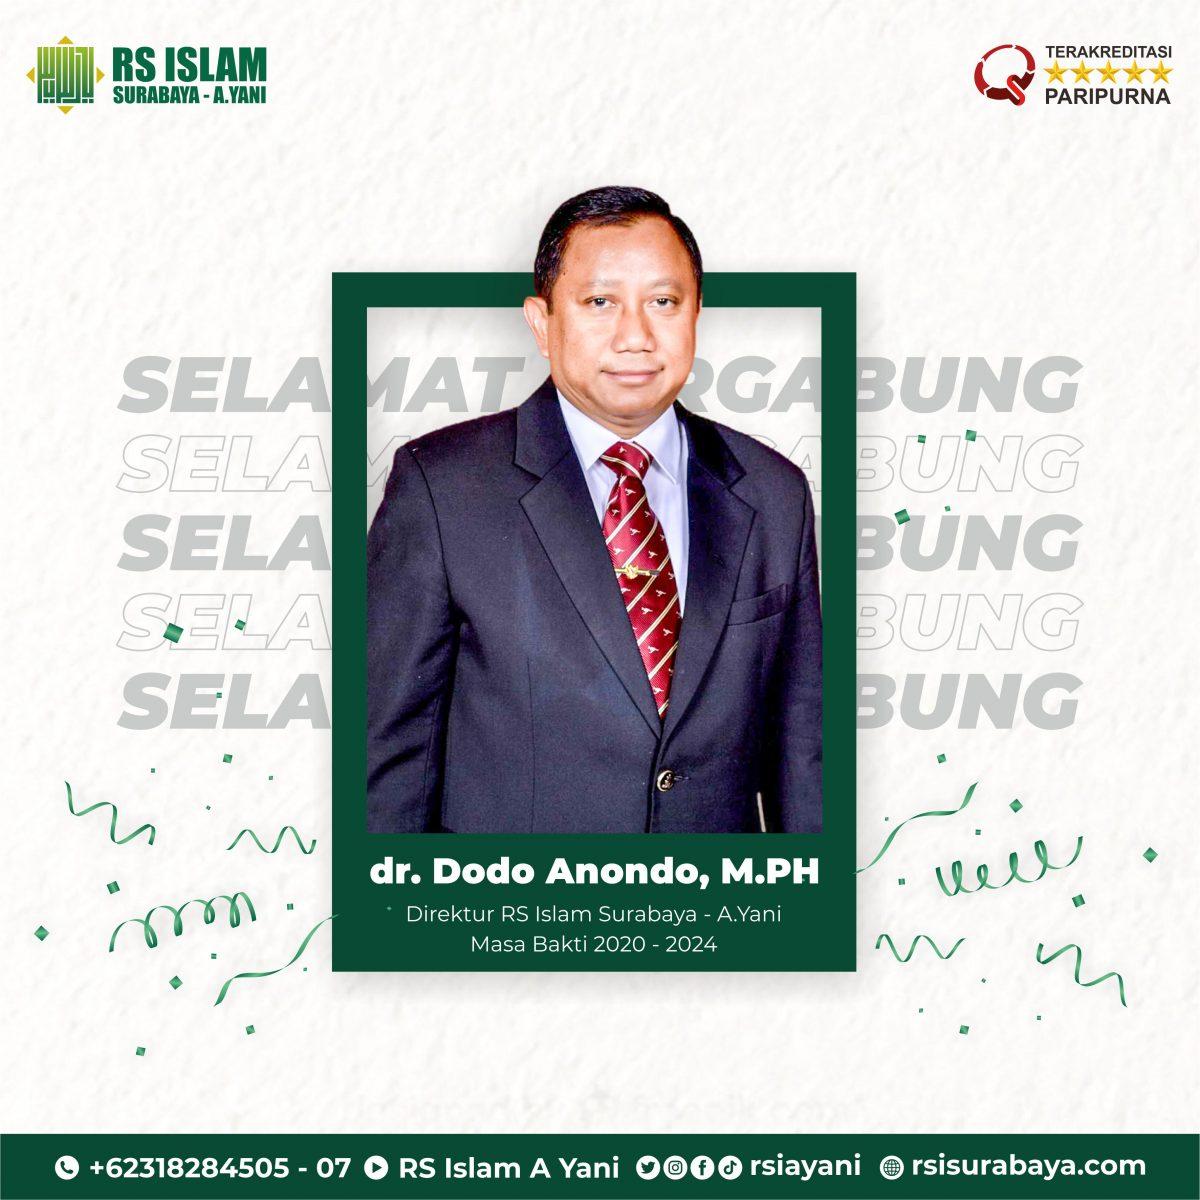 dr.-Dodo-Anondo-M.PH_-1200x1200.jpg